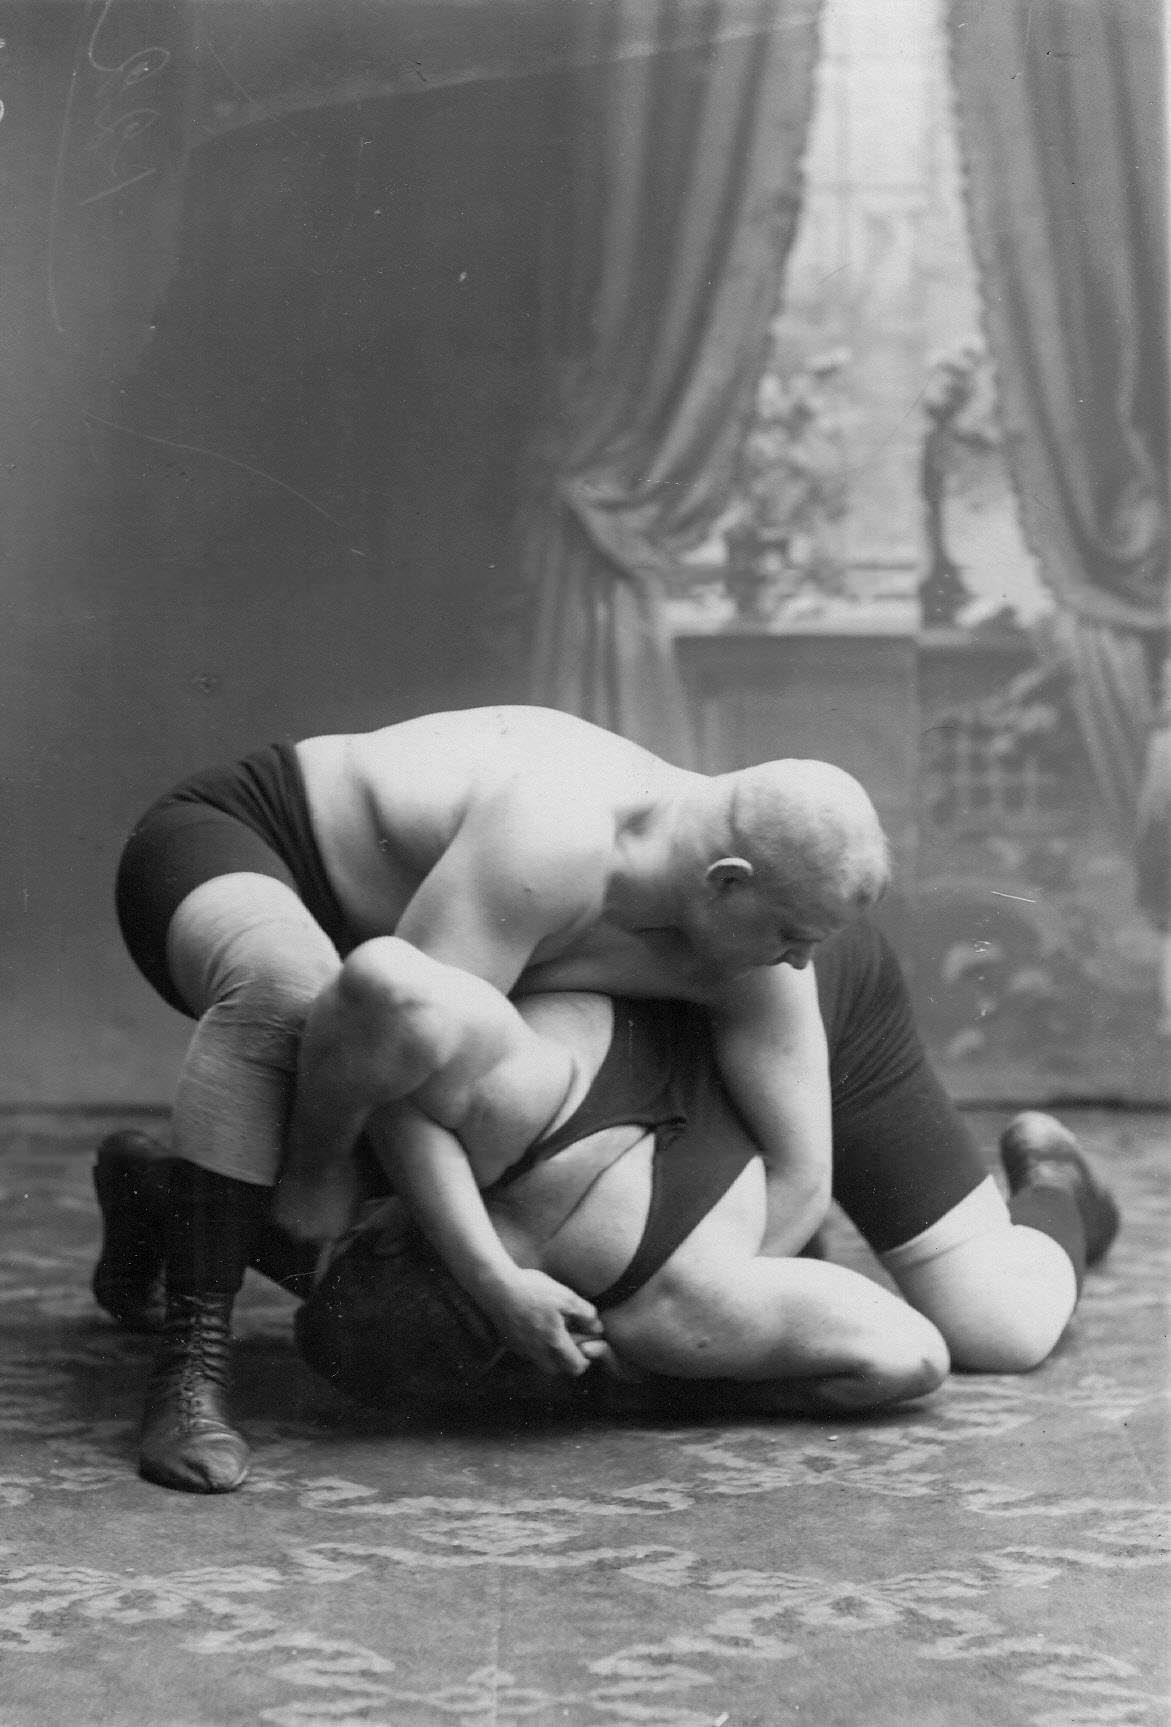 Момент французской борьбы; сверху борец А.Аберг